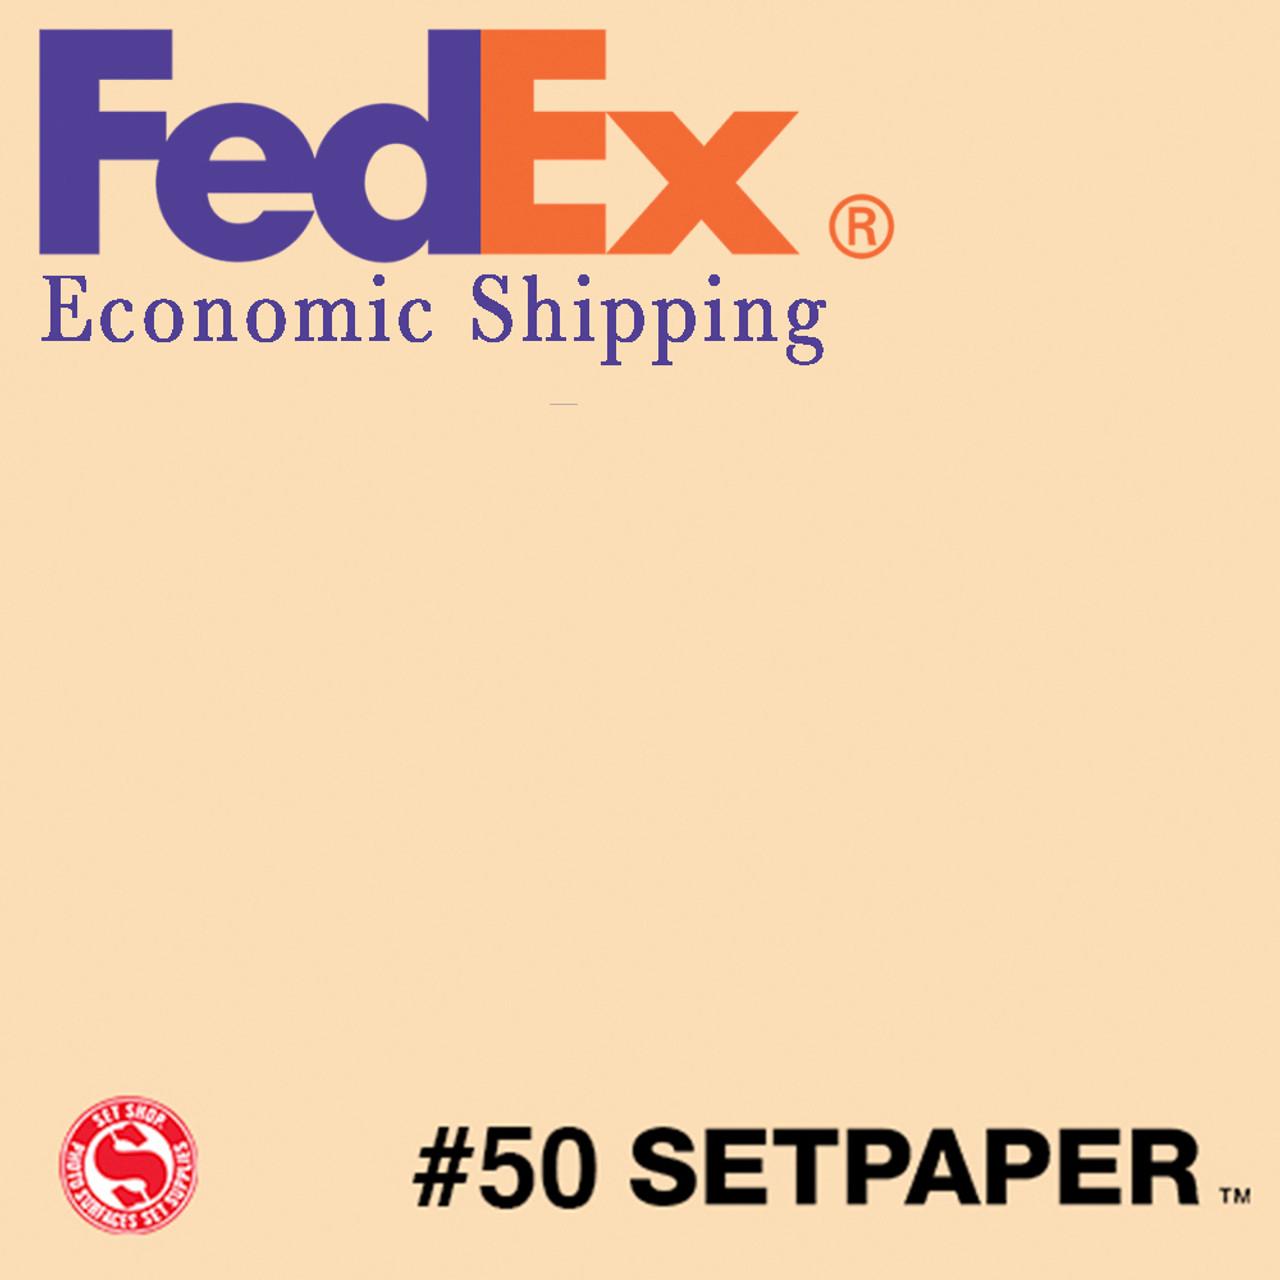 "(ECONOMIC SHIPPING) SETPAPER - EGGSHELL 48"" x 36' (1.2 x 11m)"